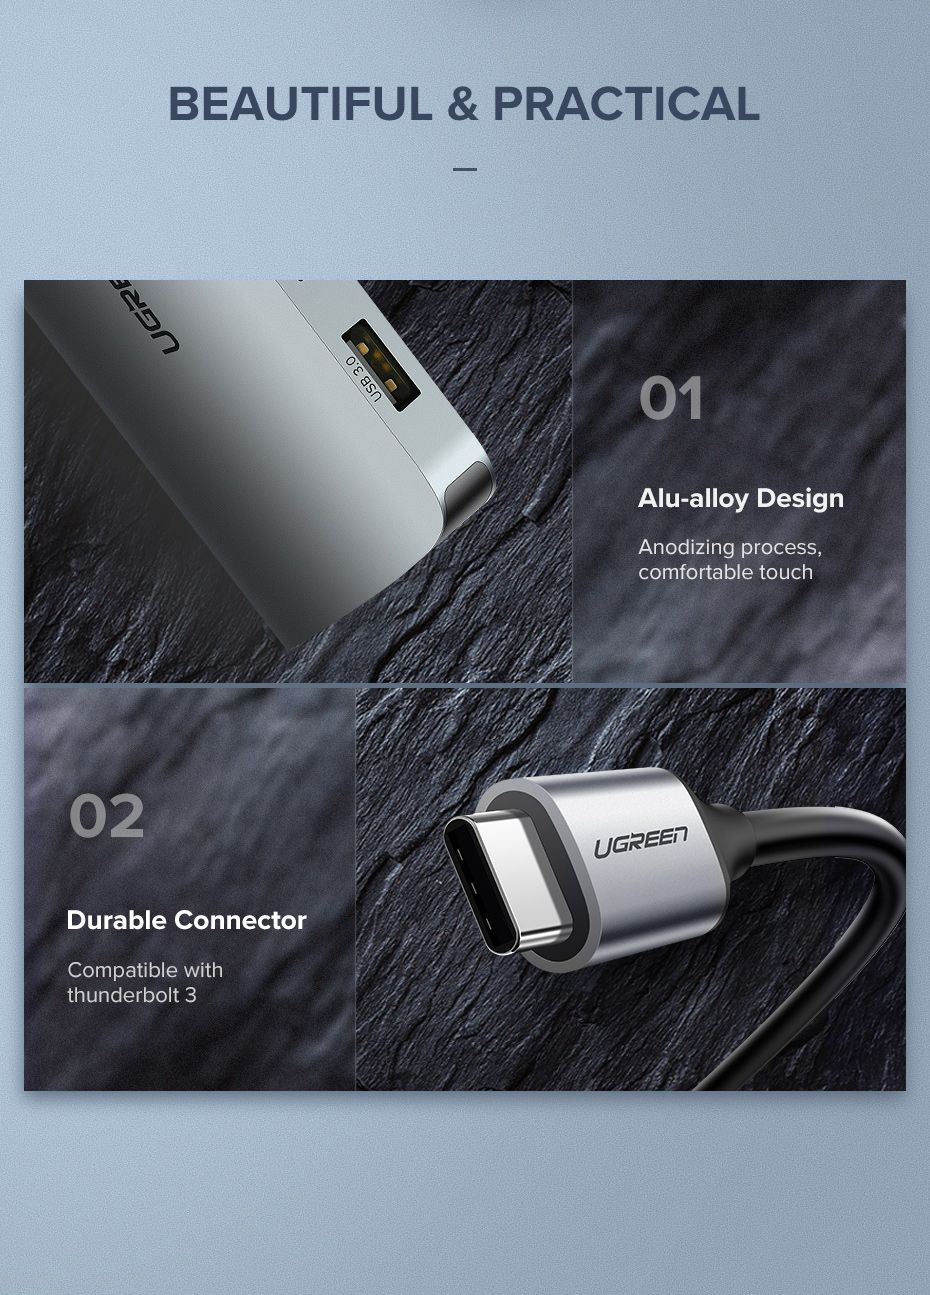 Ugreen 9 In 1 Multifunctional Usb C Hub Adapter (7)